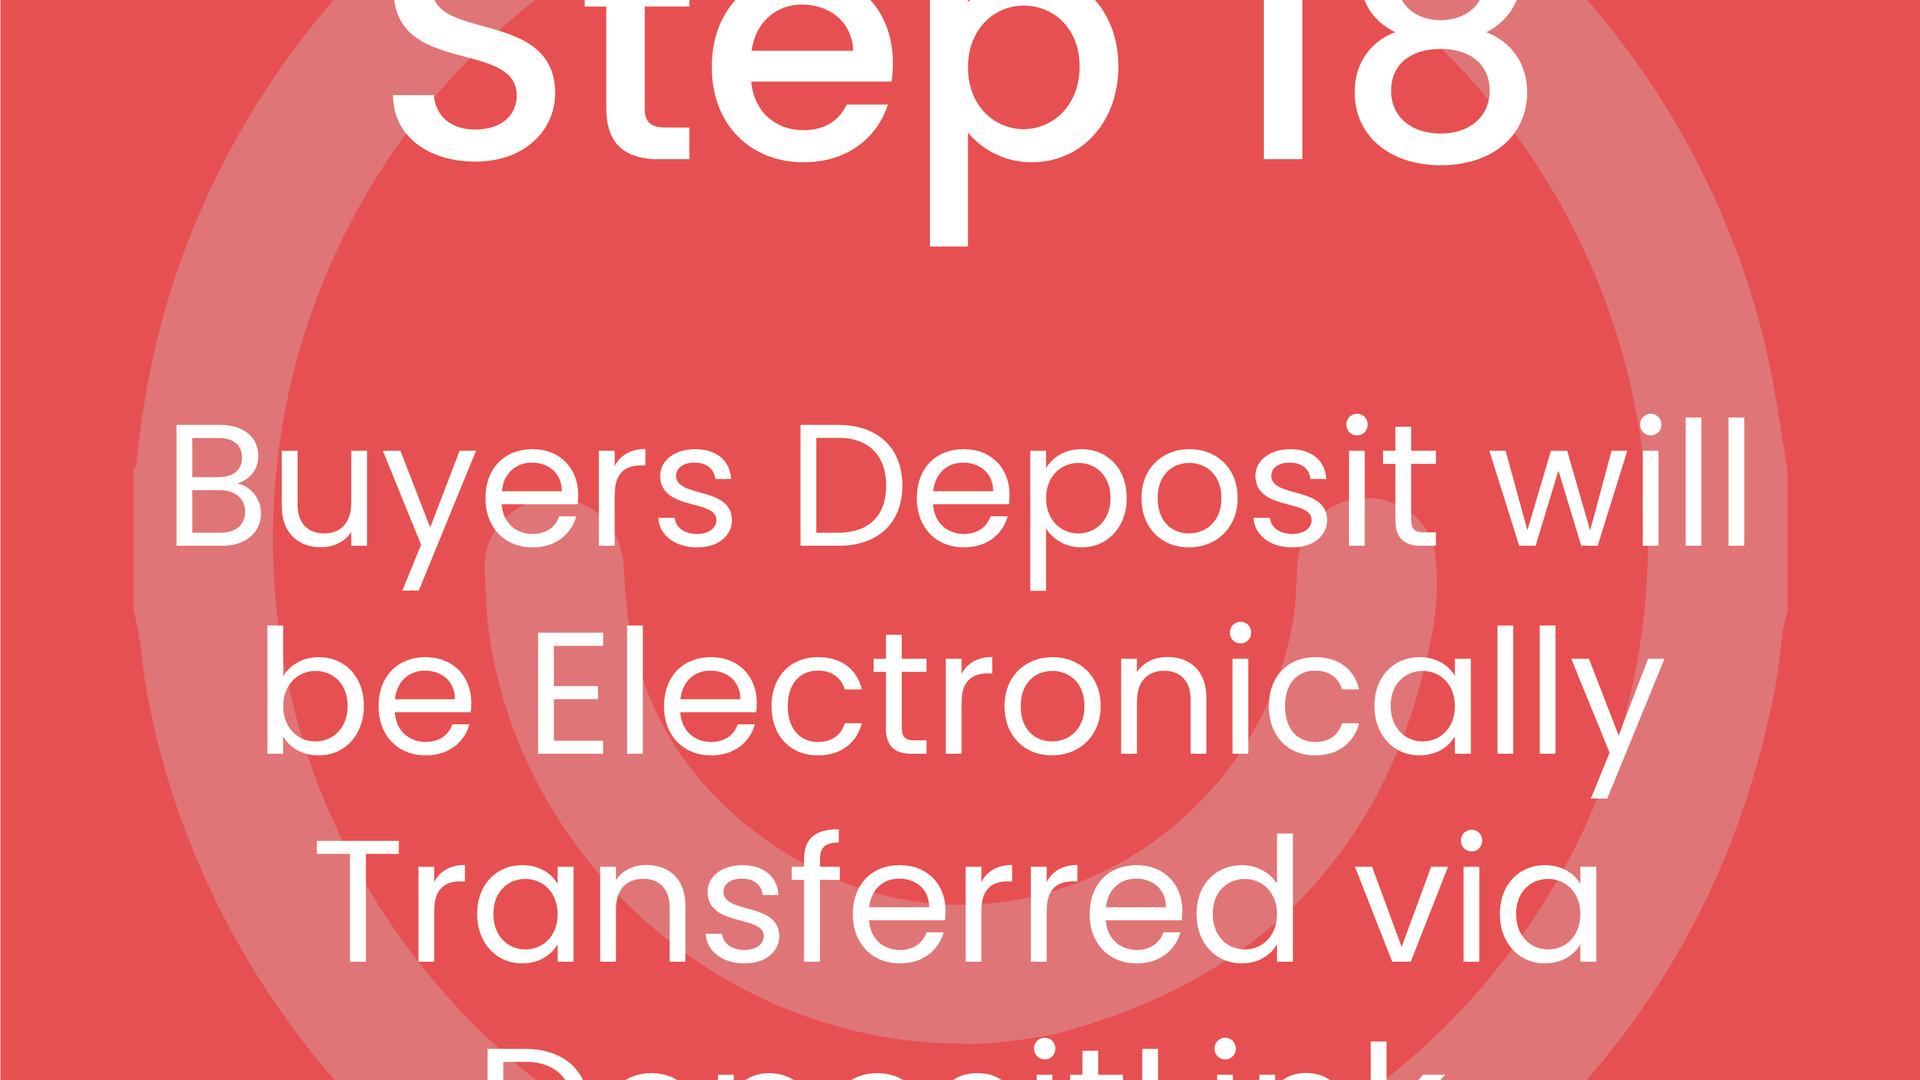 Step 18: Buyer's Deposit will be Electronically Transferred via Dotloop